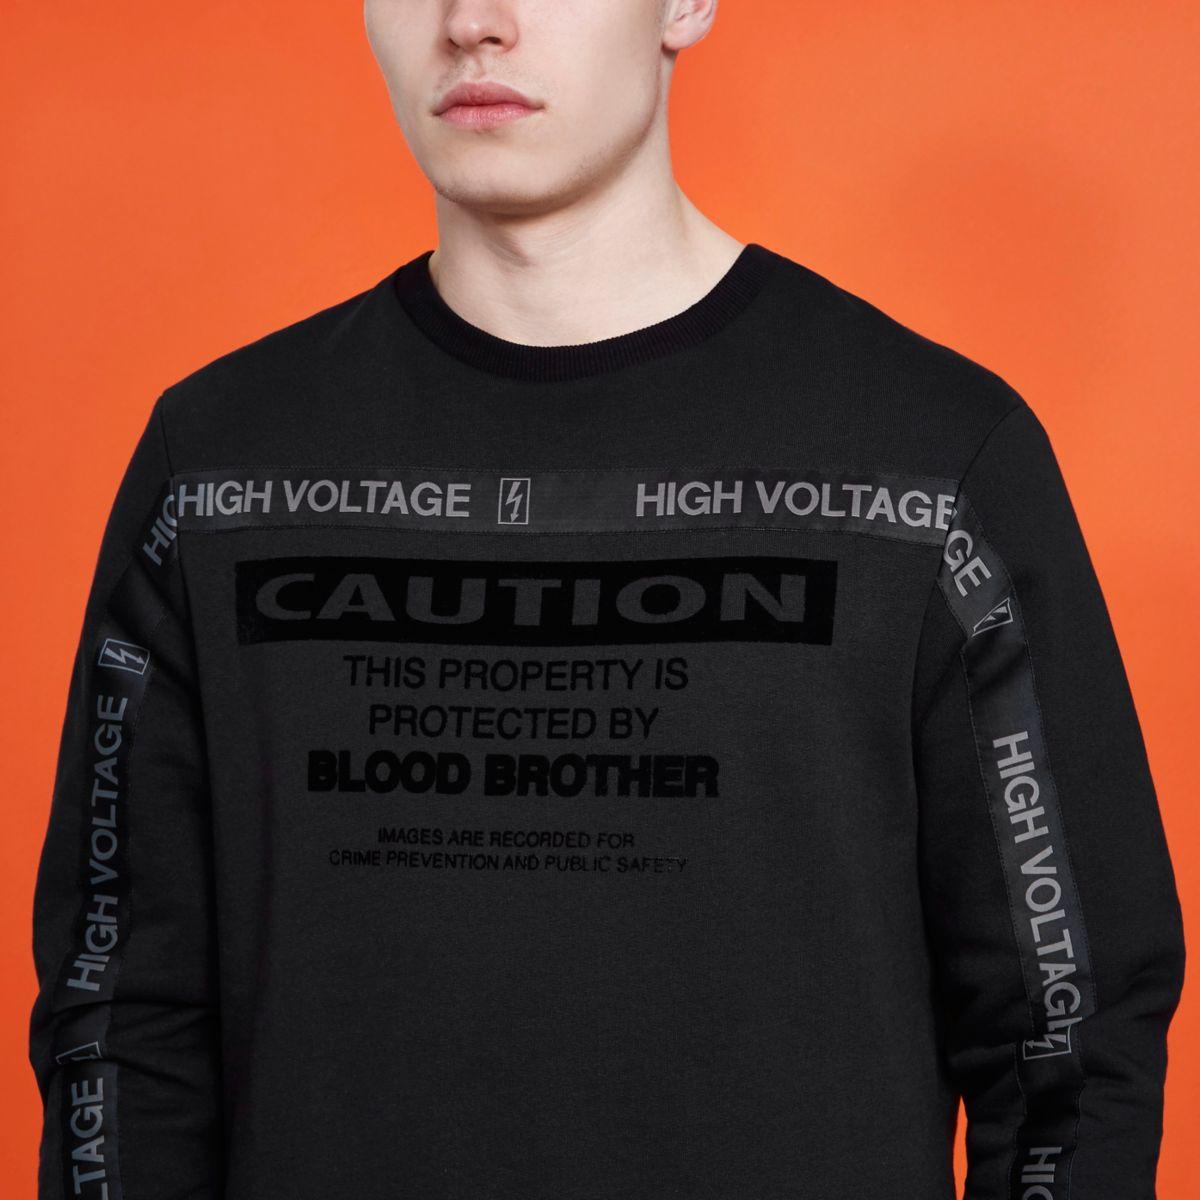 Black Blood Brother 'caution' tape sweatshirt